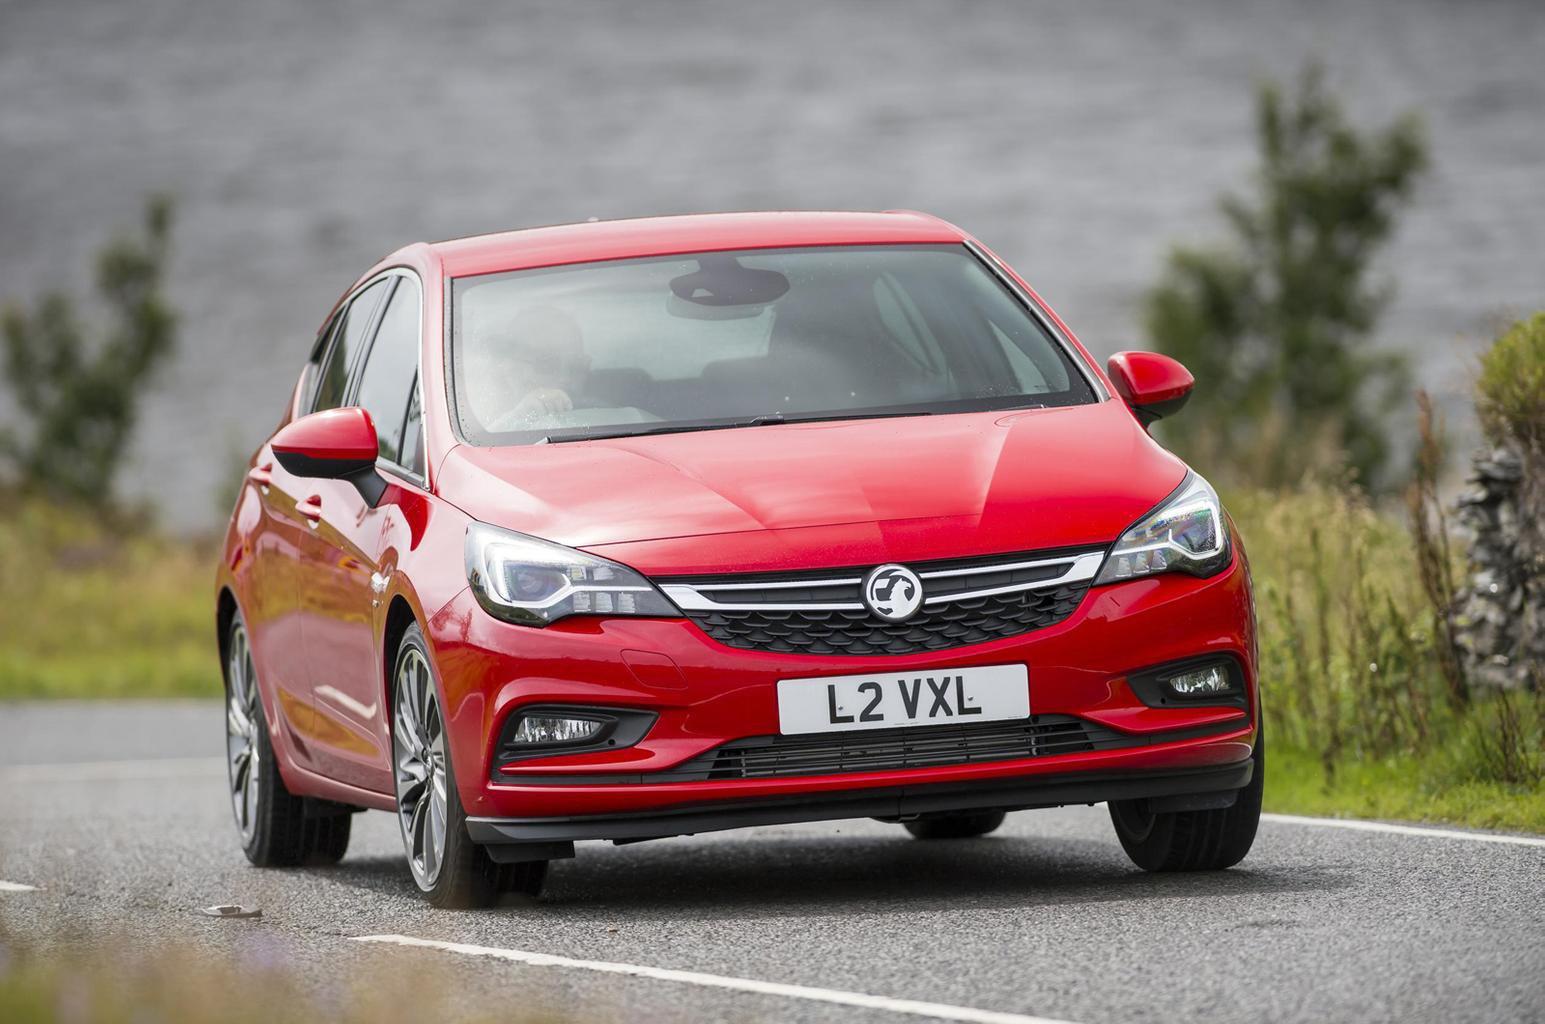 2015 Vauxhall Astra 1.0 Turbo Ecoflex review